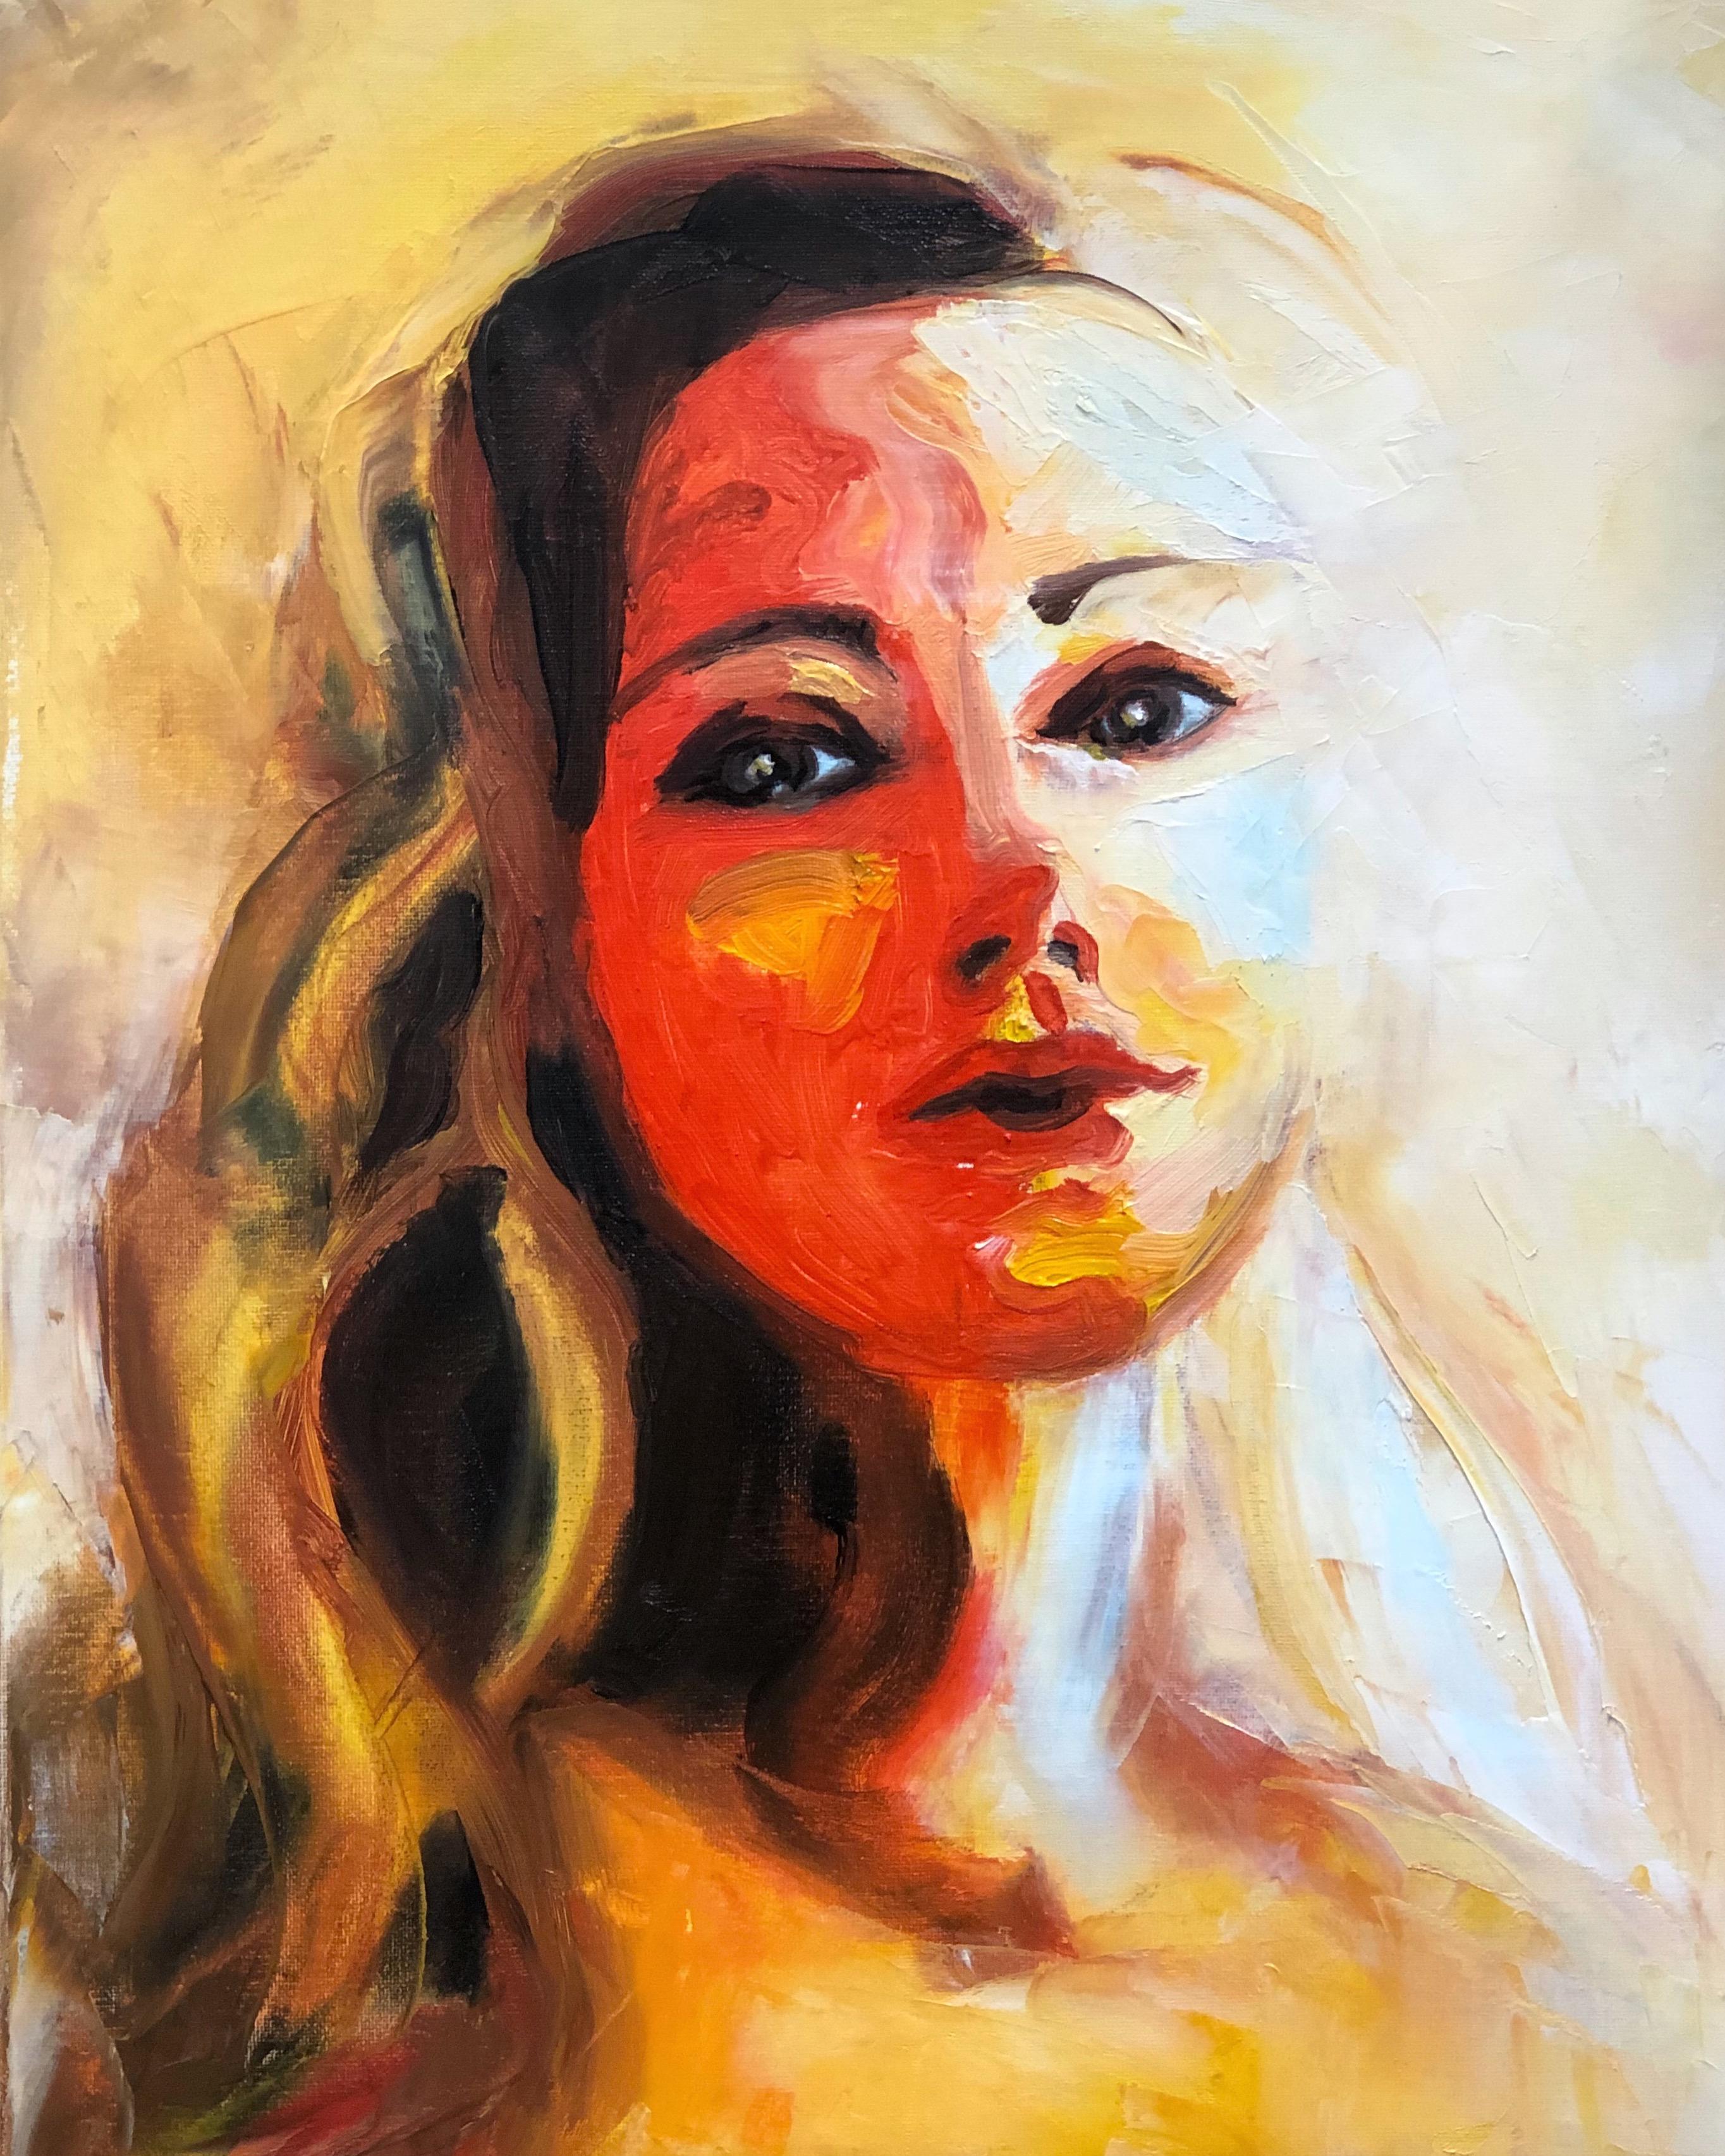 artist self-portrait